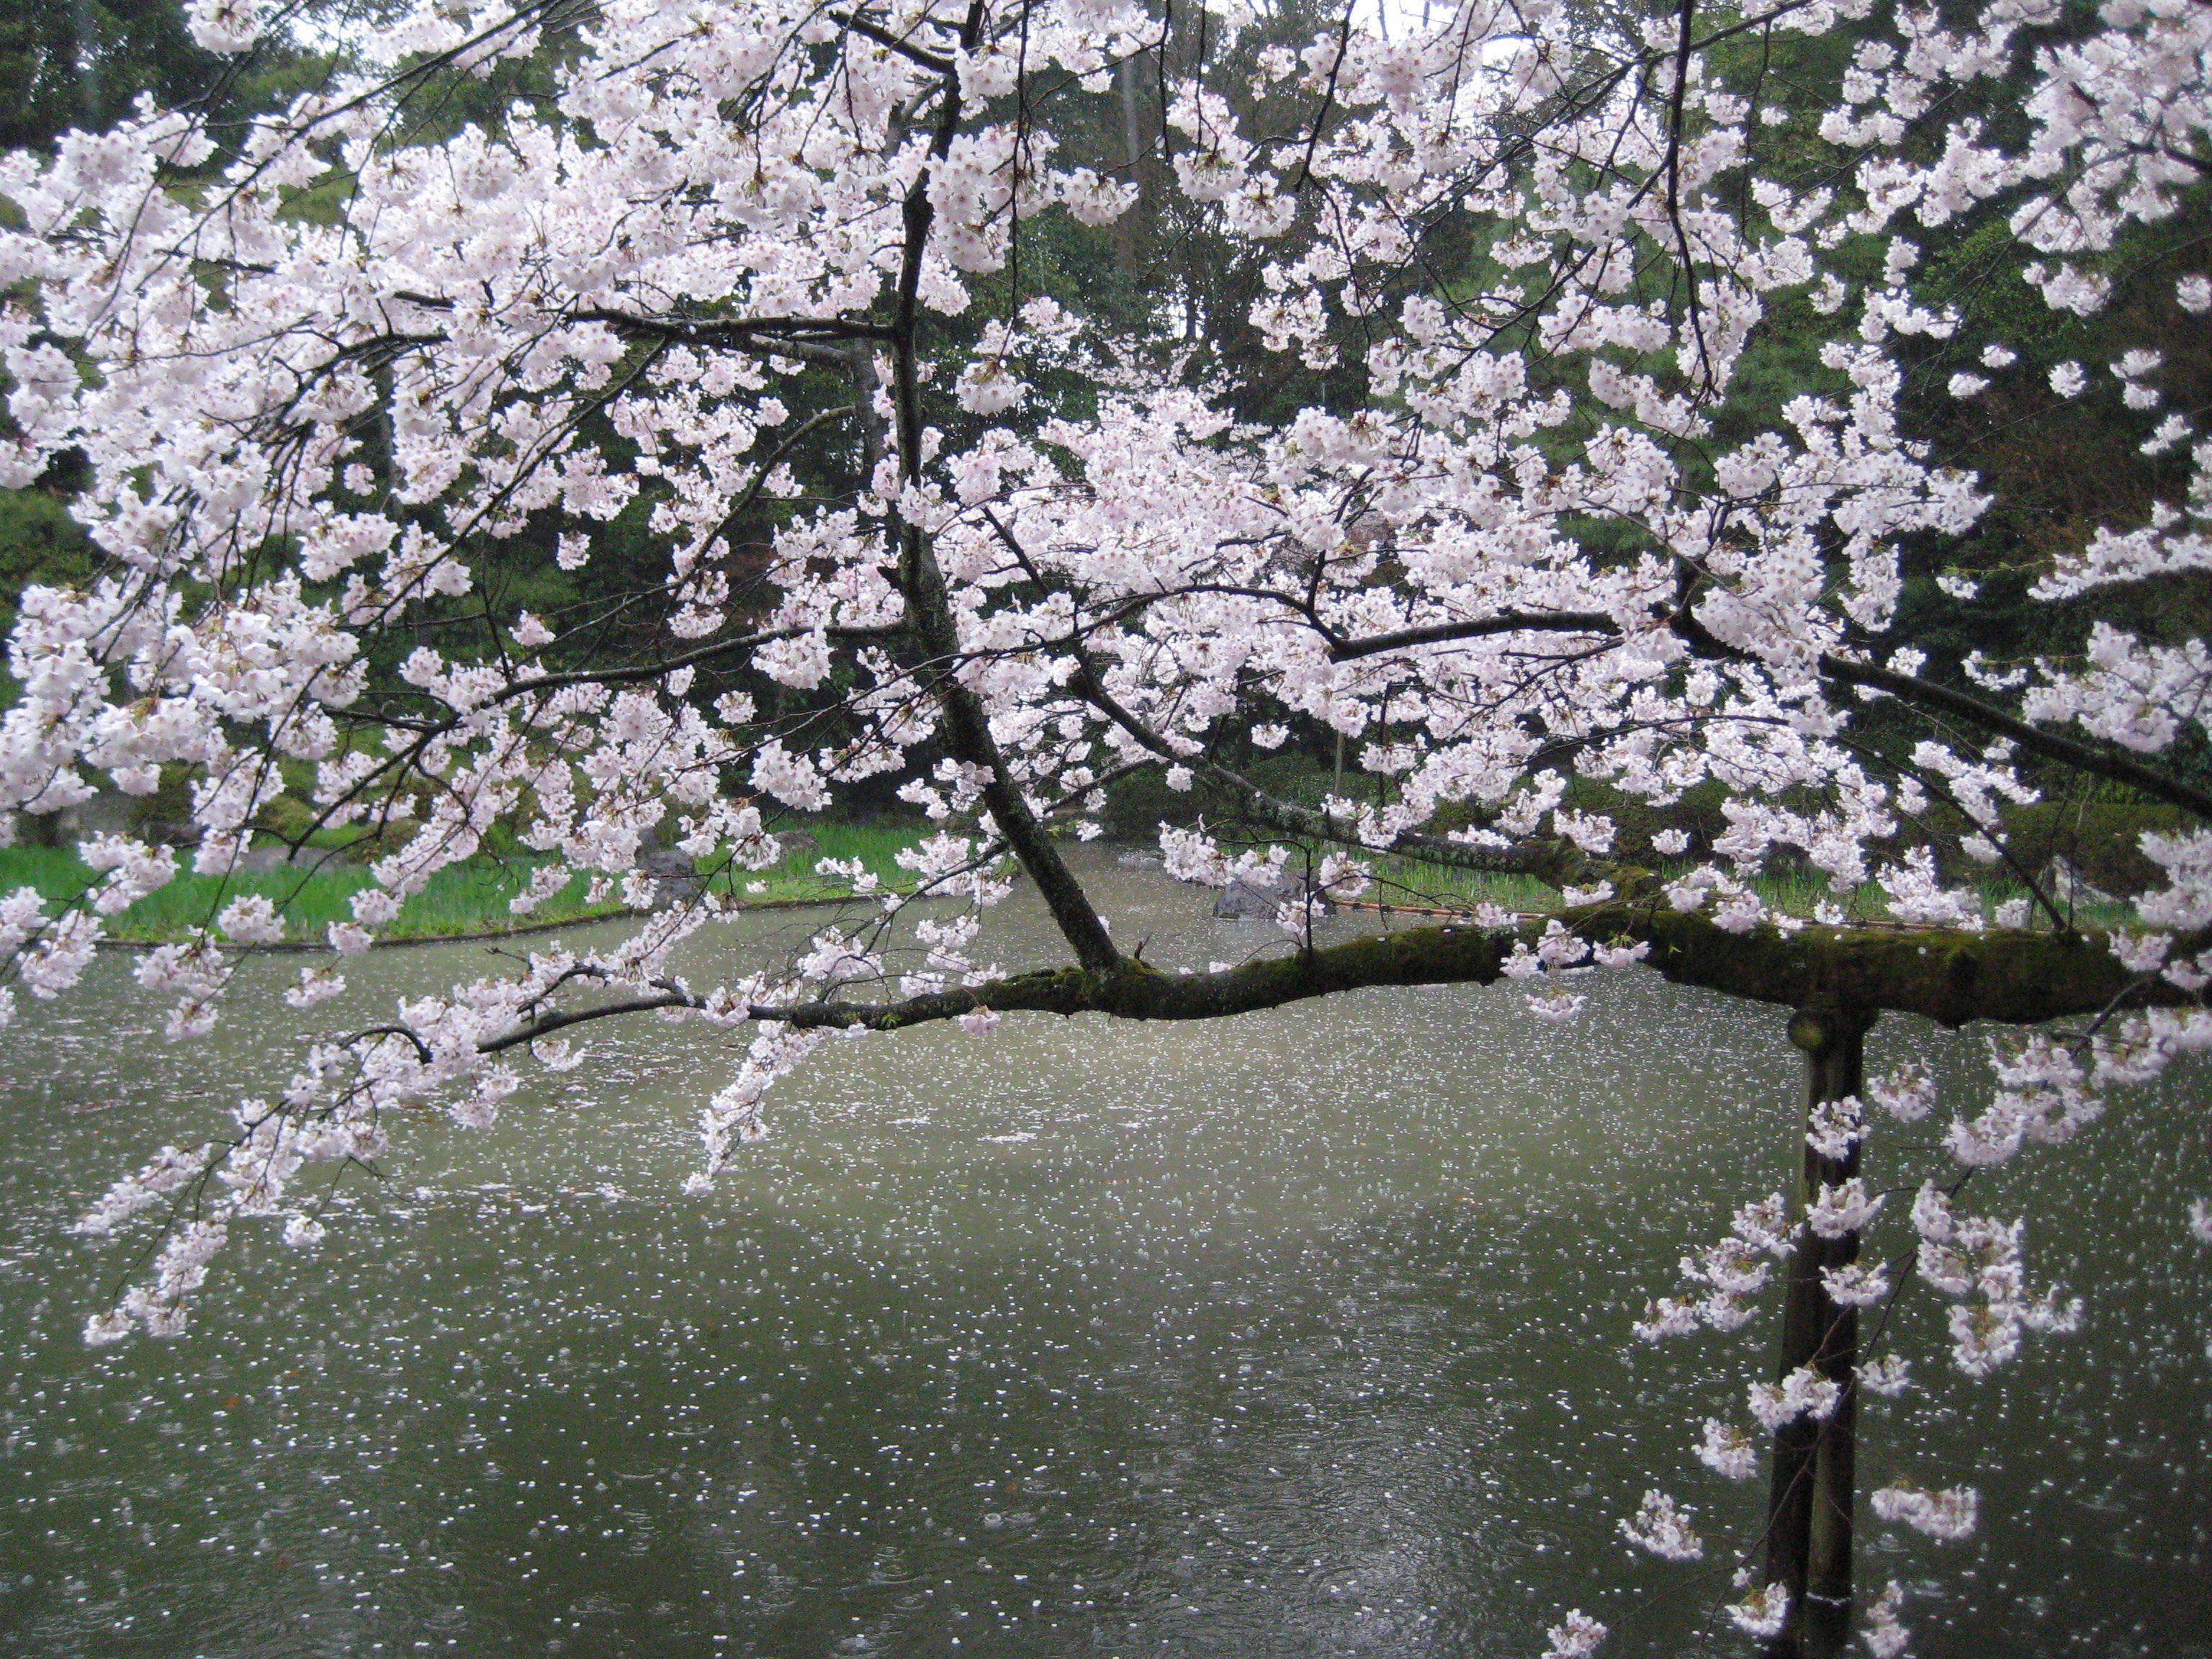 Best Ways To Enjoy The Washington D C Cherry Blossom Festival Cherry Blossom Festival Places To Go Favorite Places